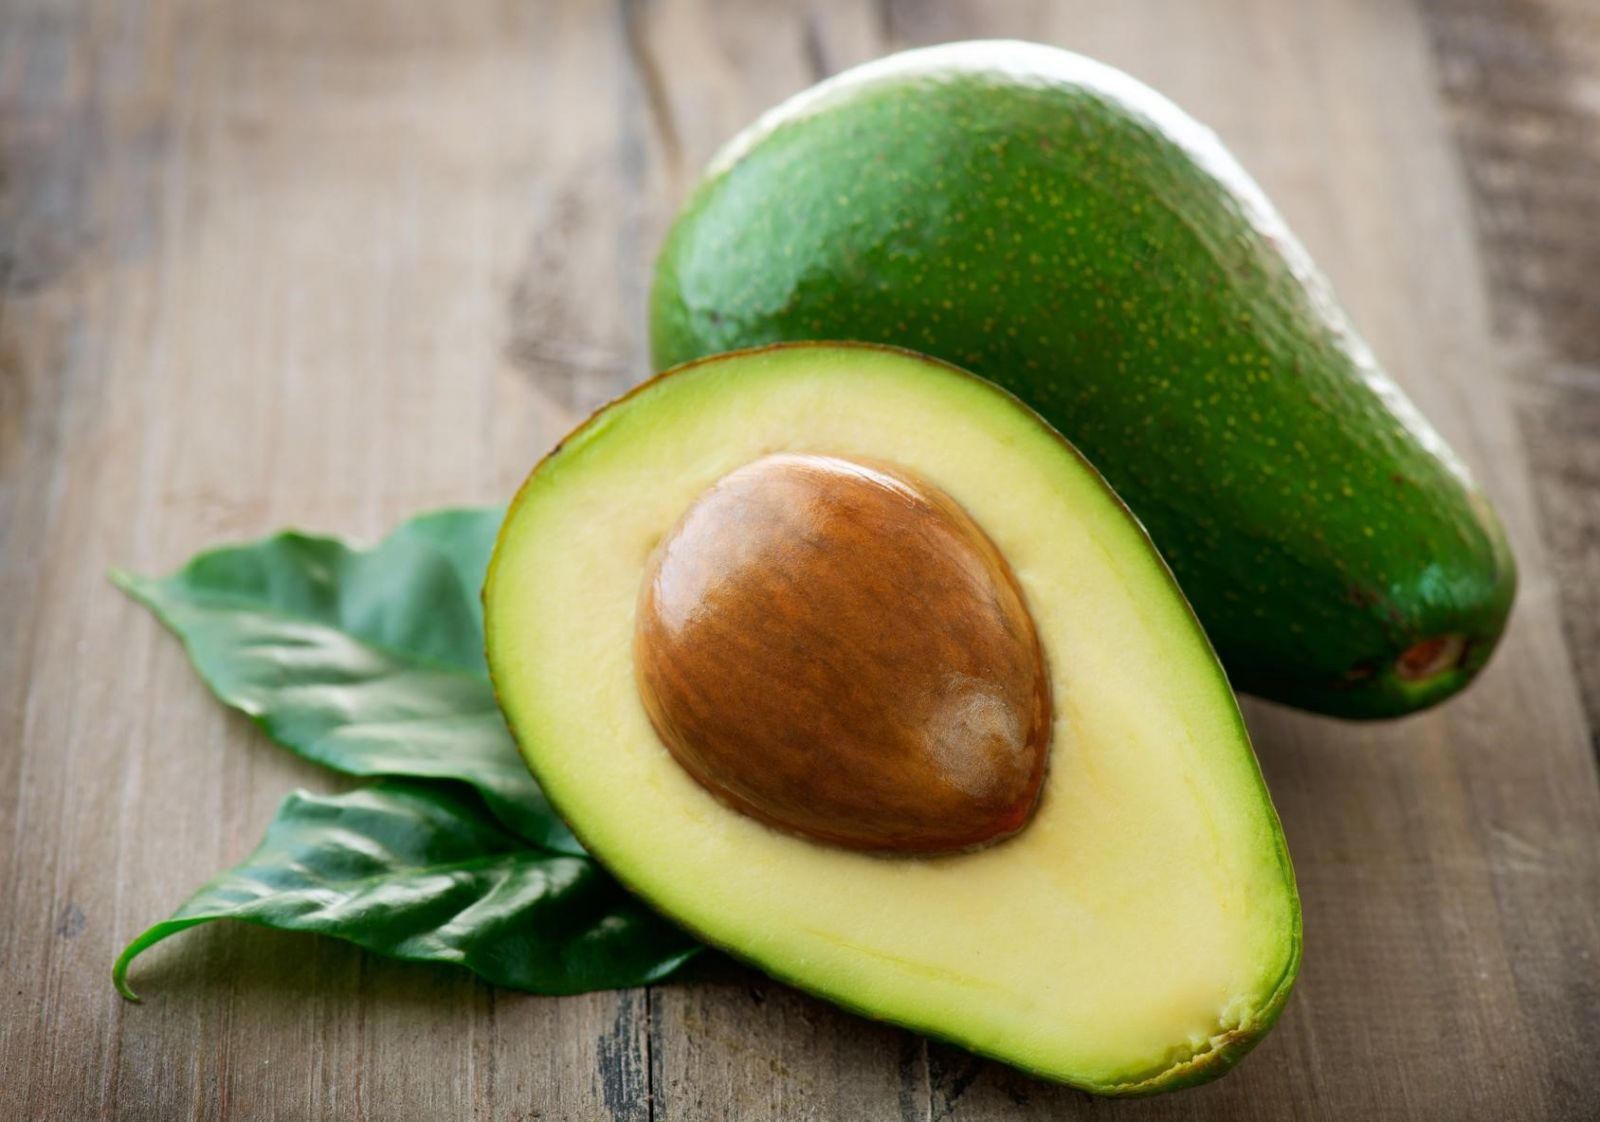 авокадо фото в разрезе